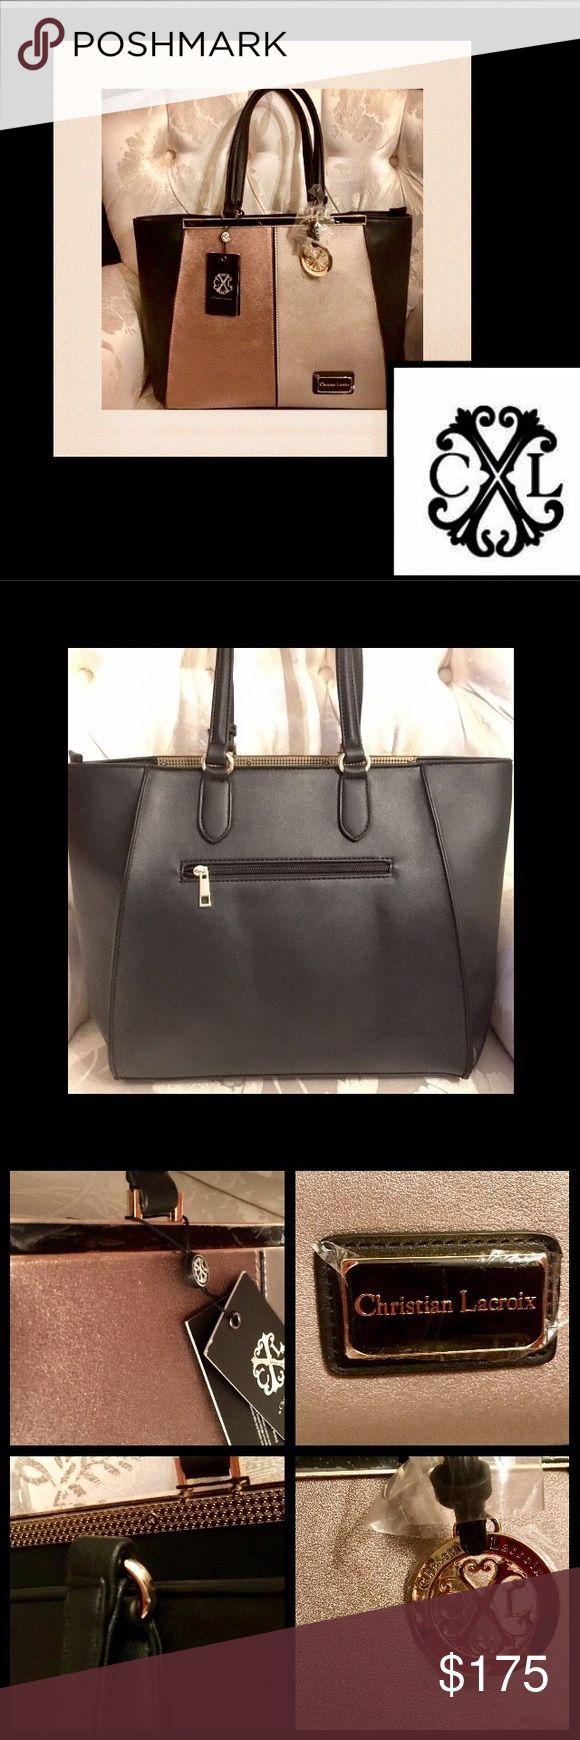 Spotted while shopping on Poshmark: 🆕Christian Lacroix🌹Black/GoldLeather SabrinaTote! #poshmark #fashion #shopping #style #Christian Lacroix #Handbags